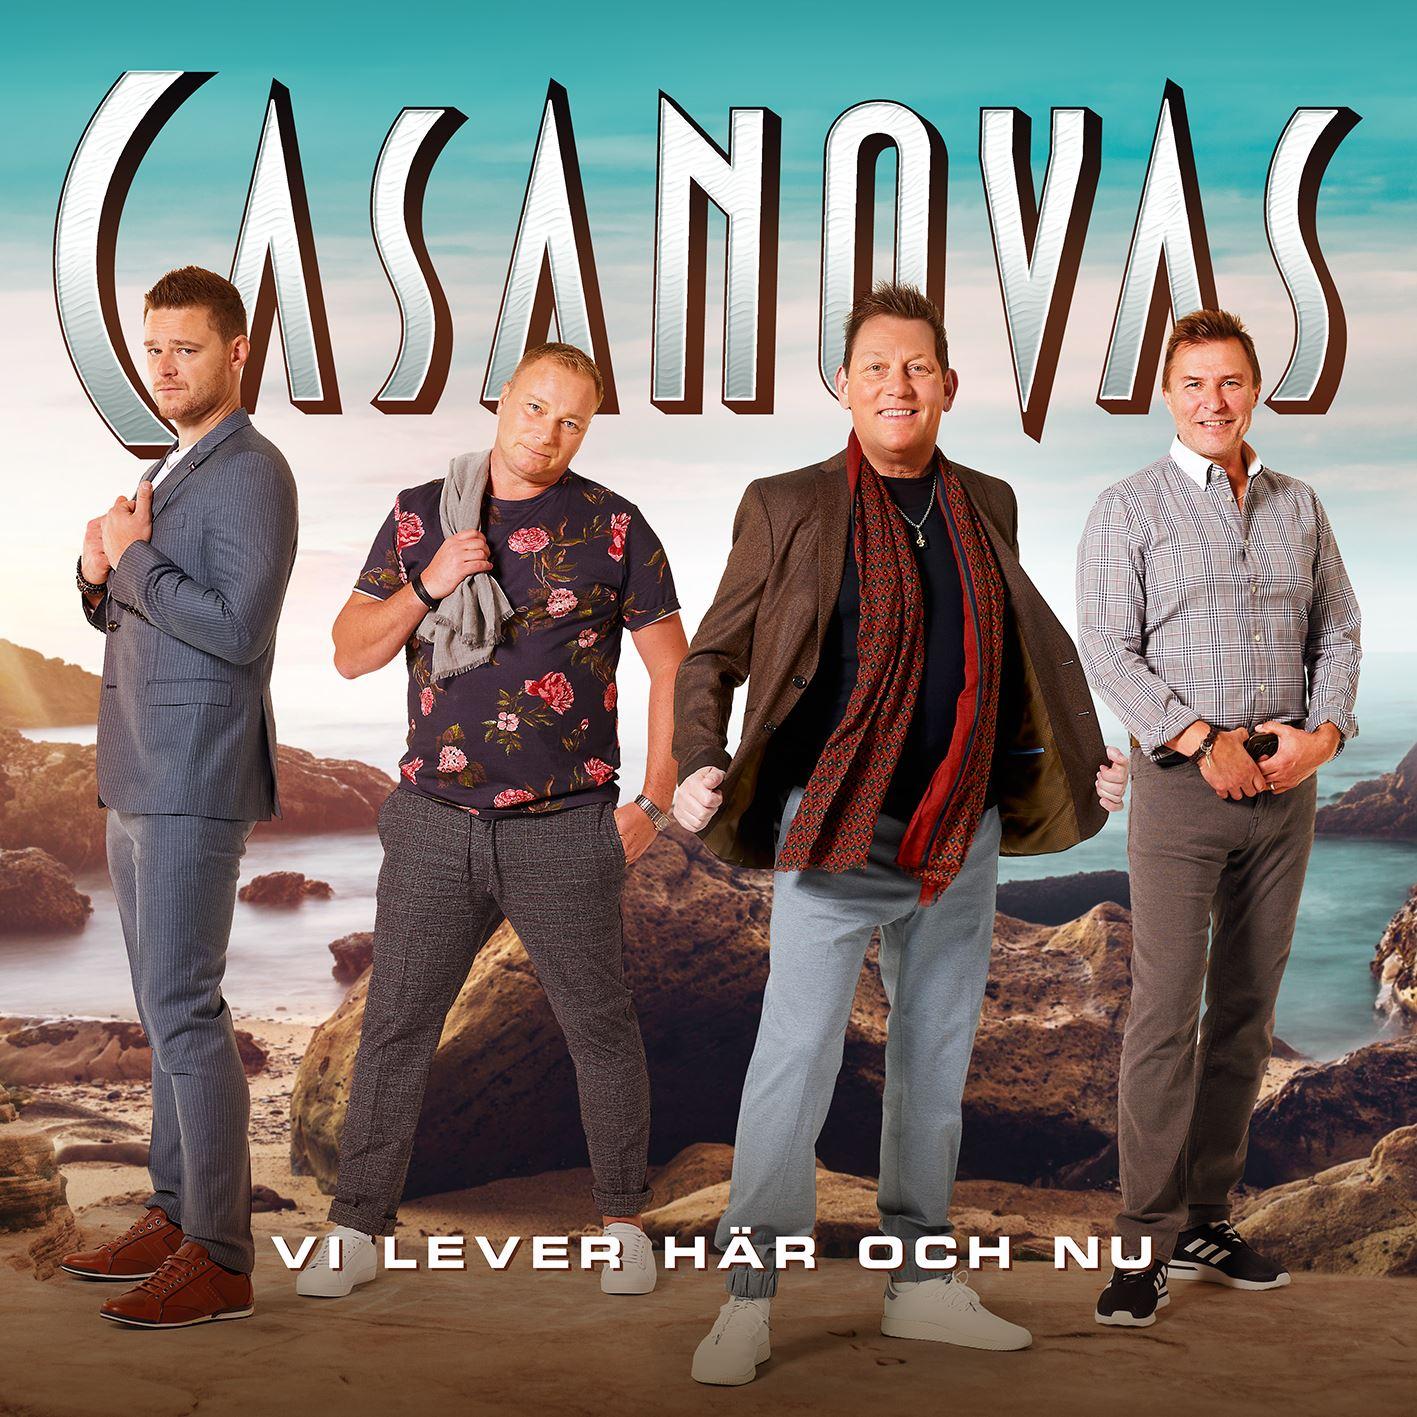 Logdans - Casanovas